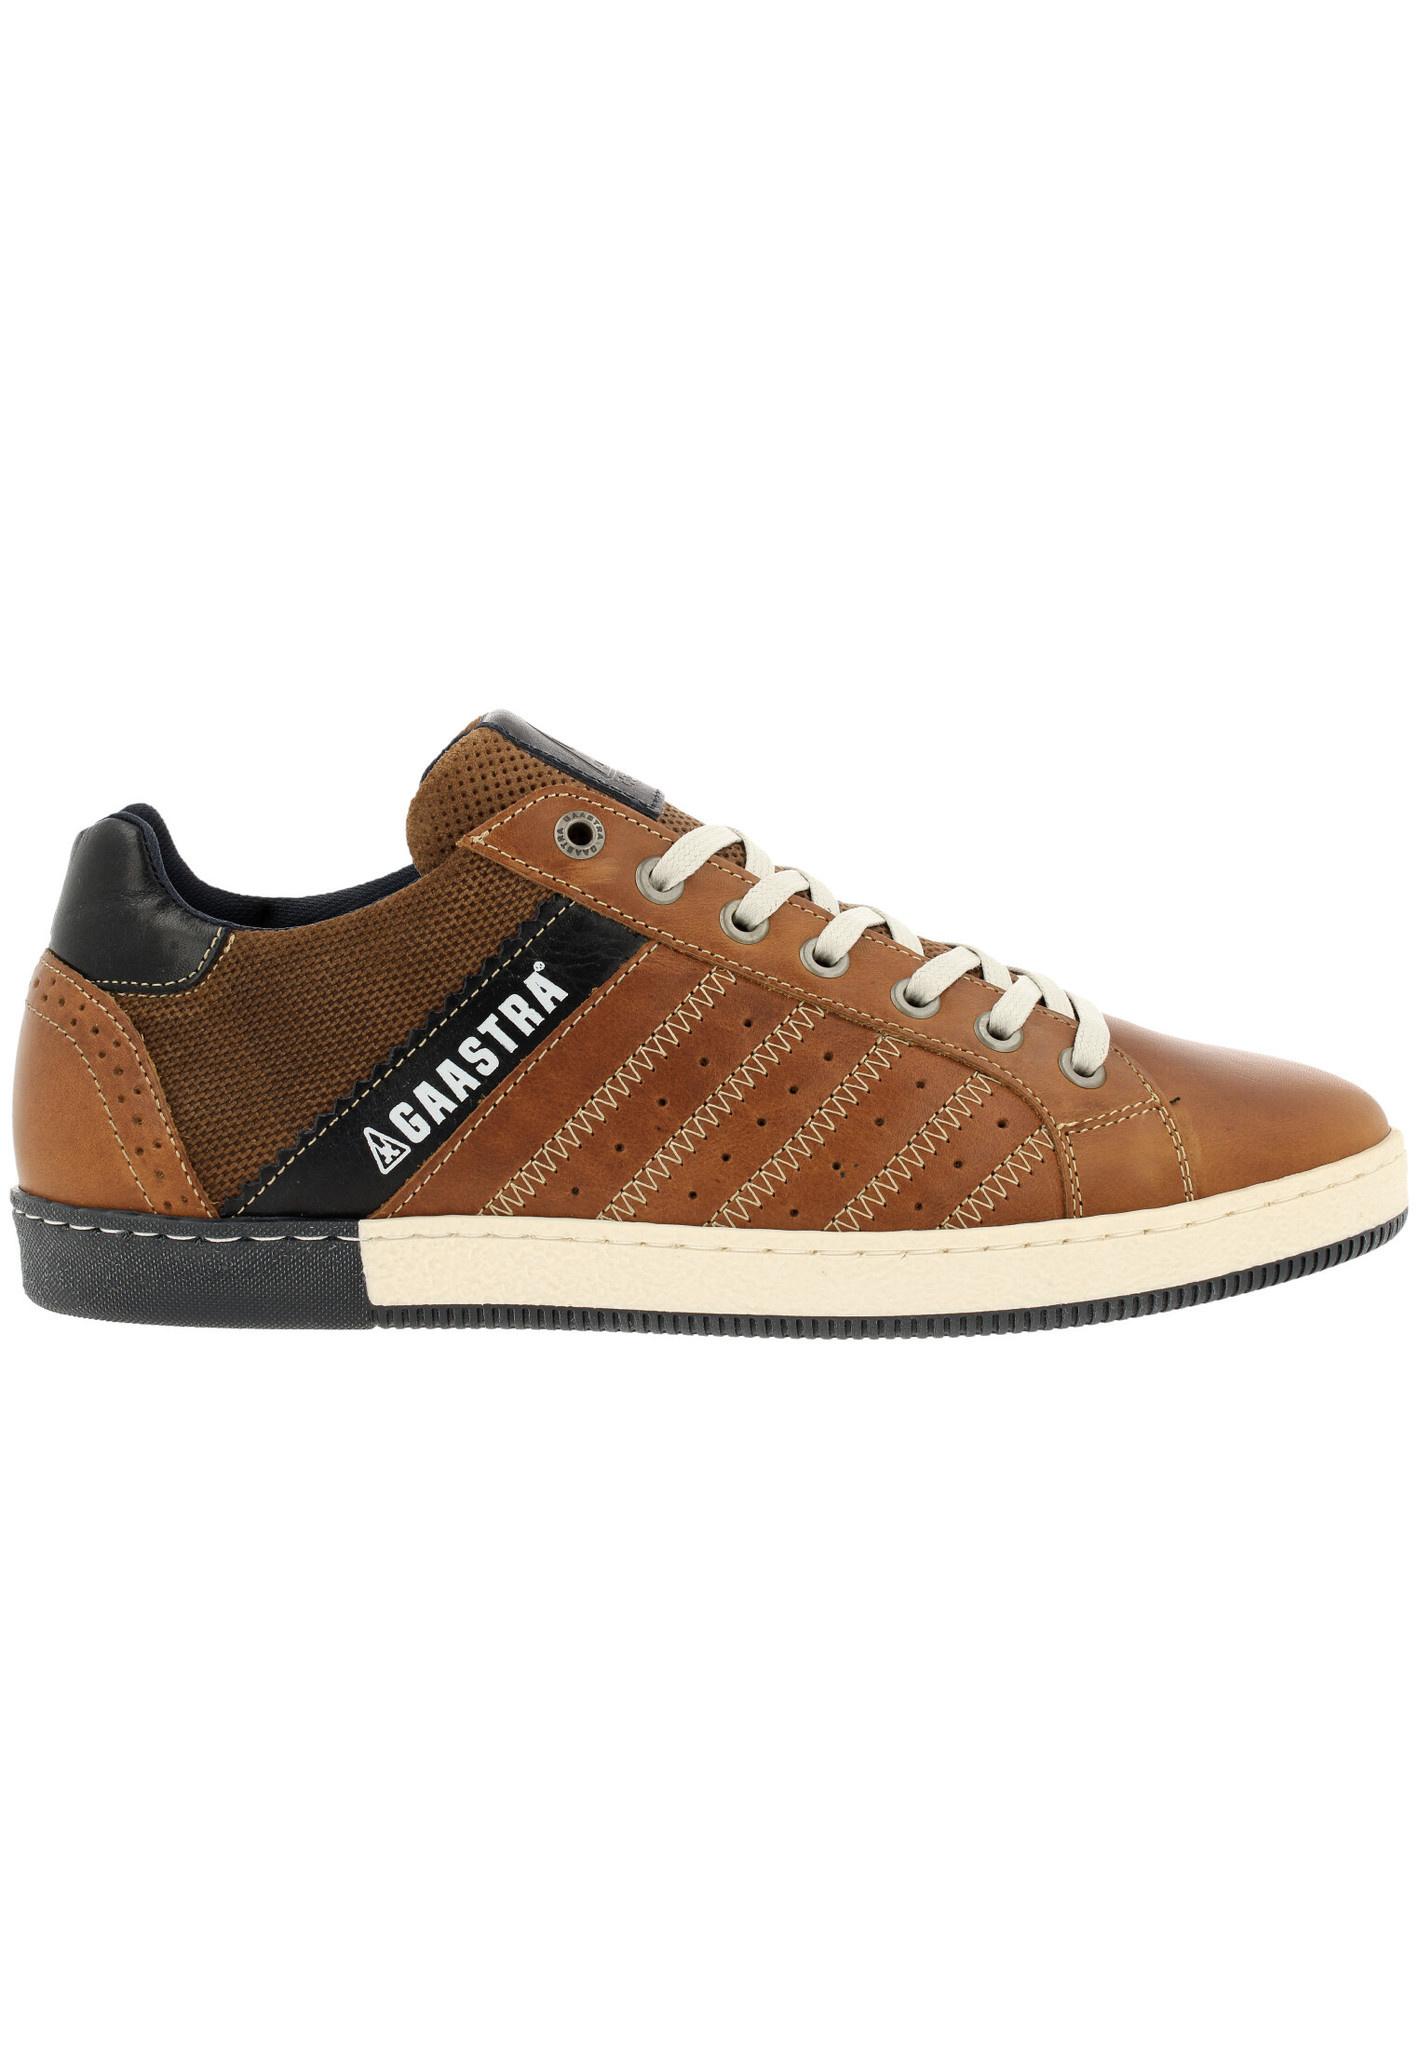 Sneakers WILHELM LEA - cognac